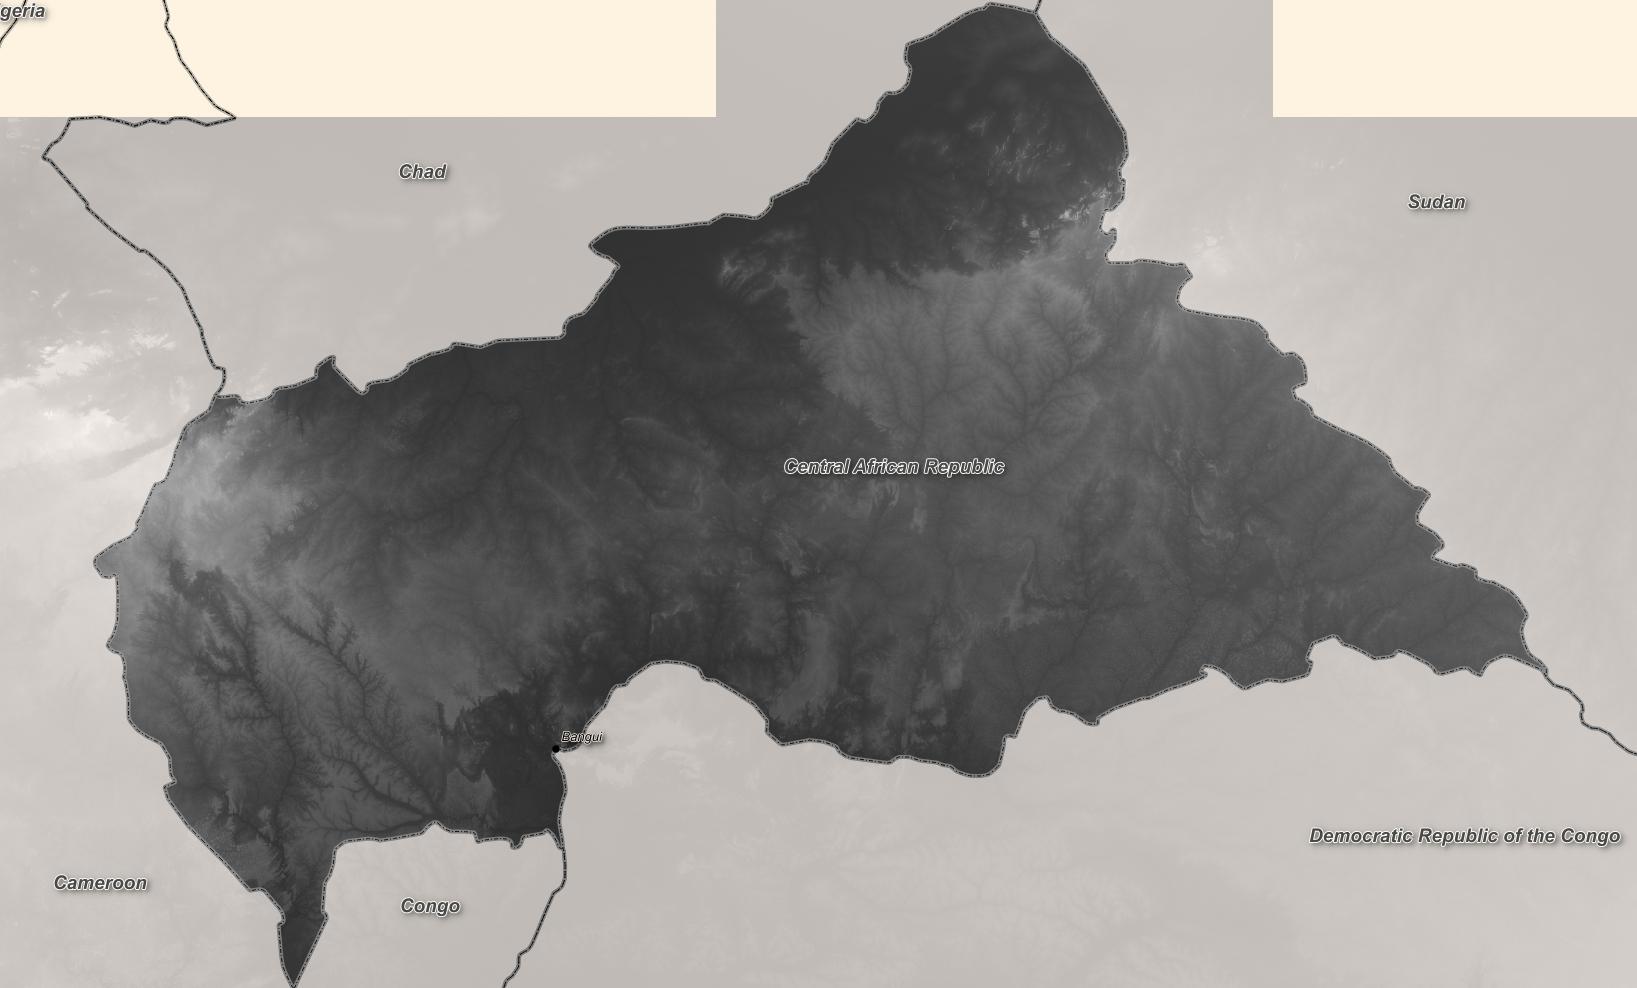 Karta Sverige Hojdkurvor.Karta Geosupportsystem